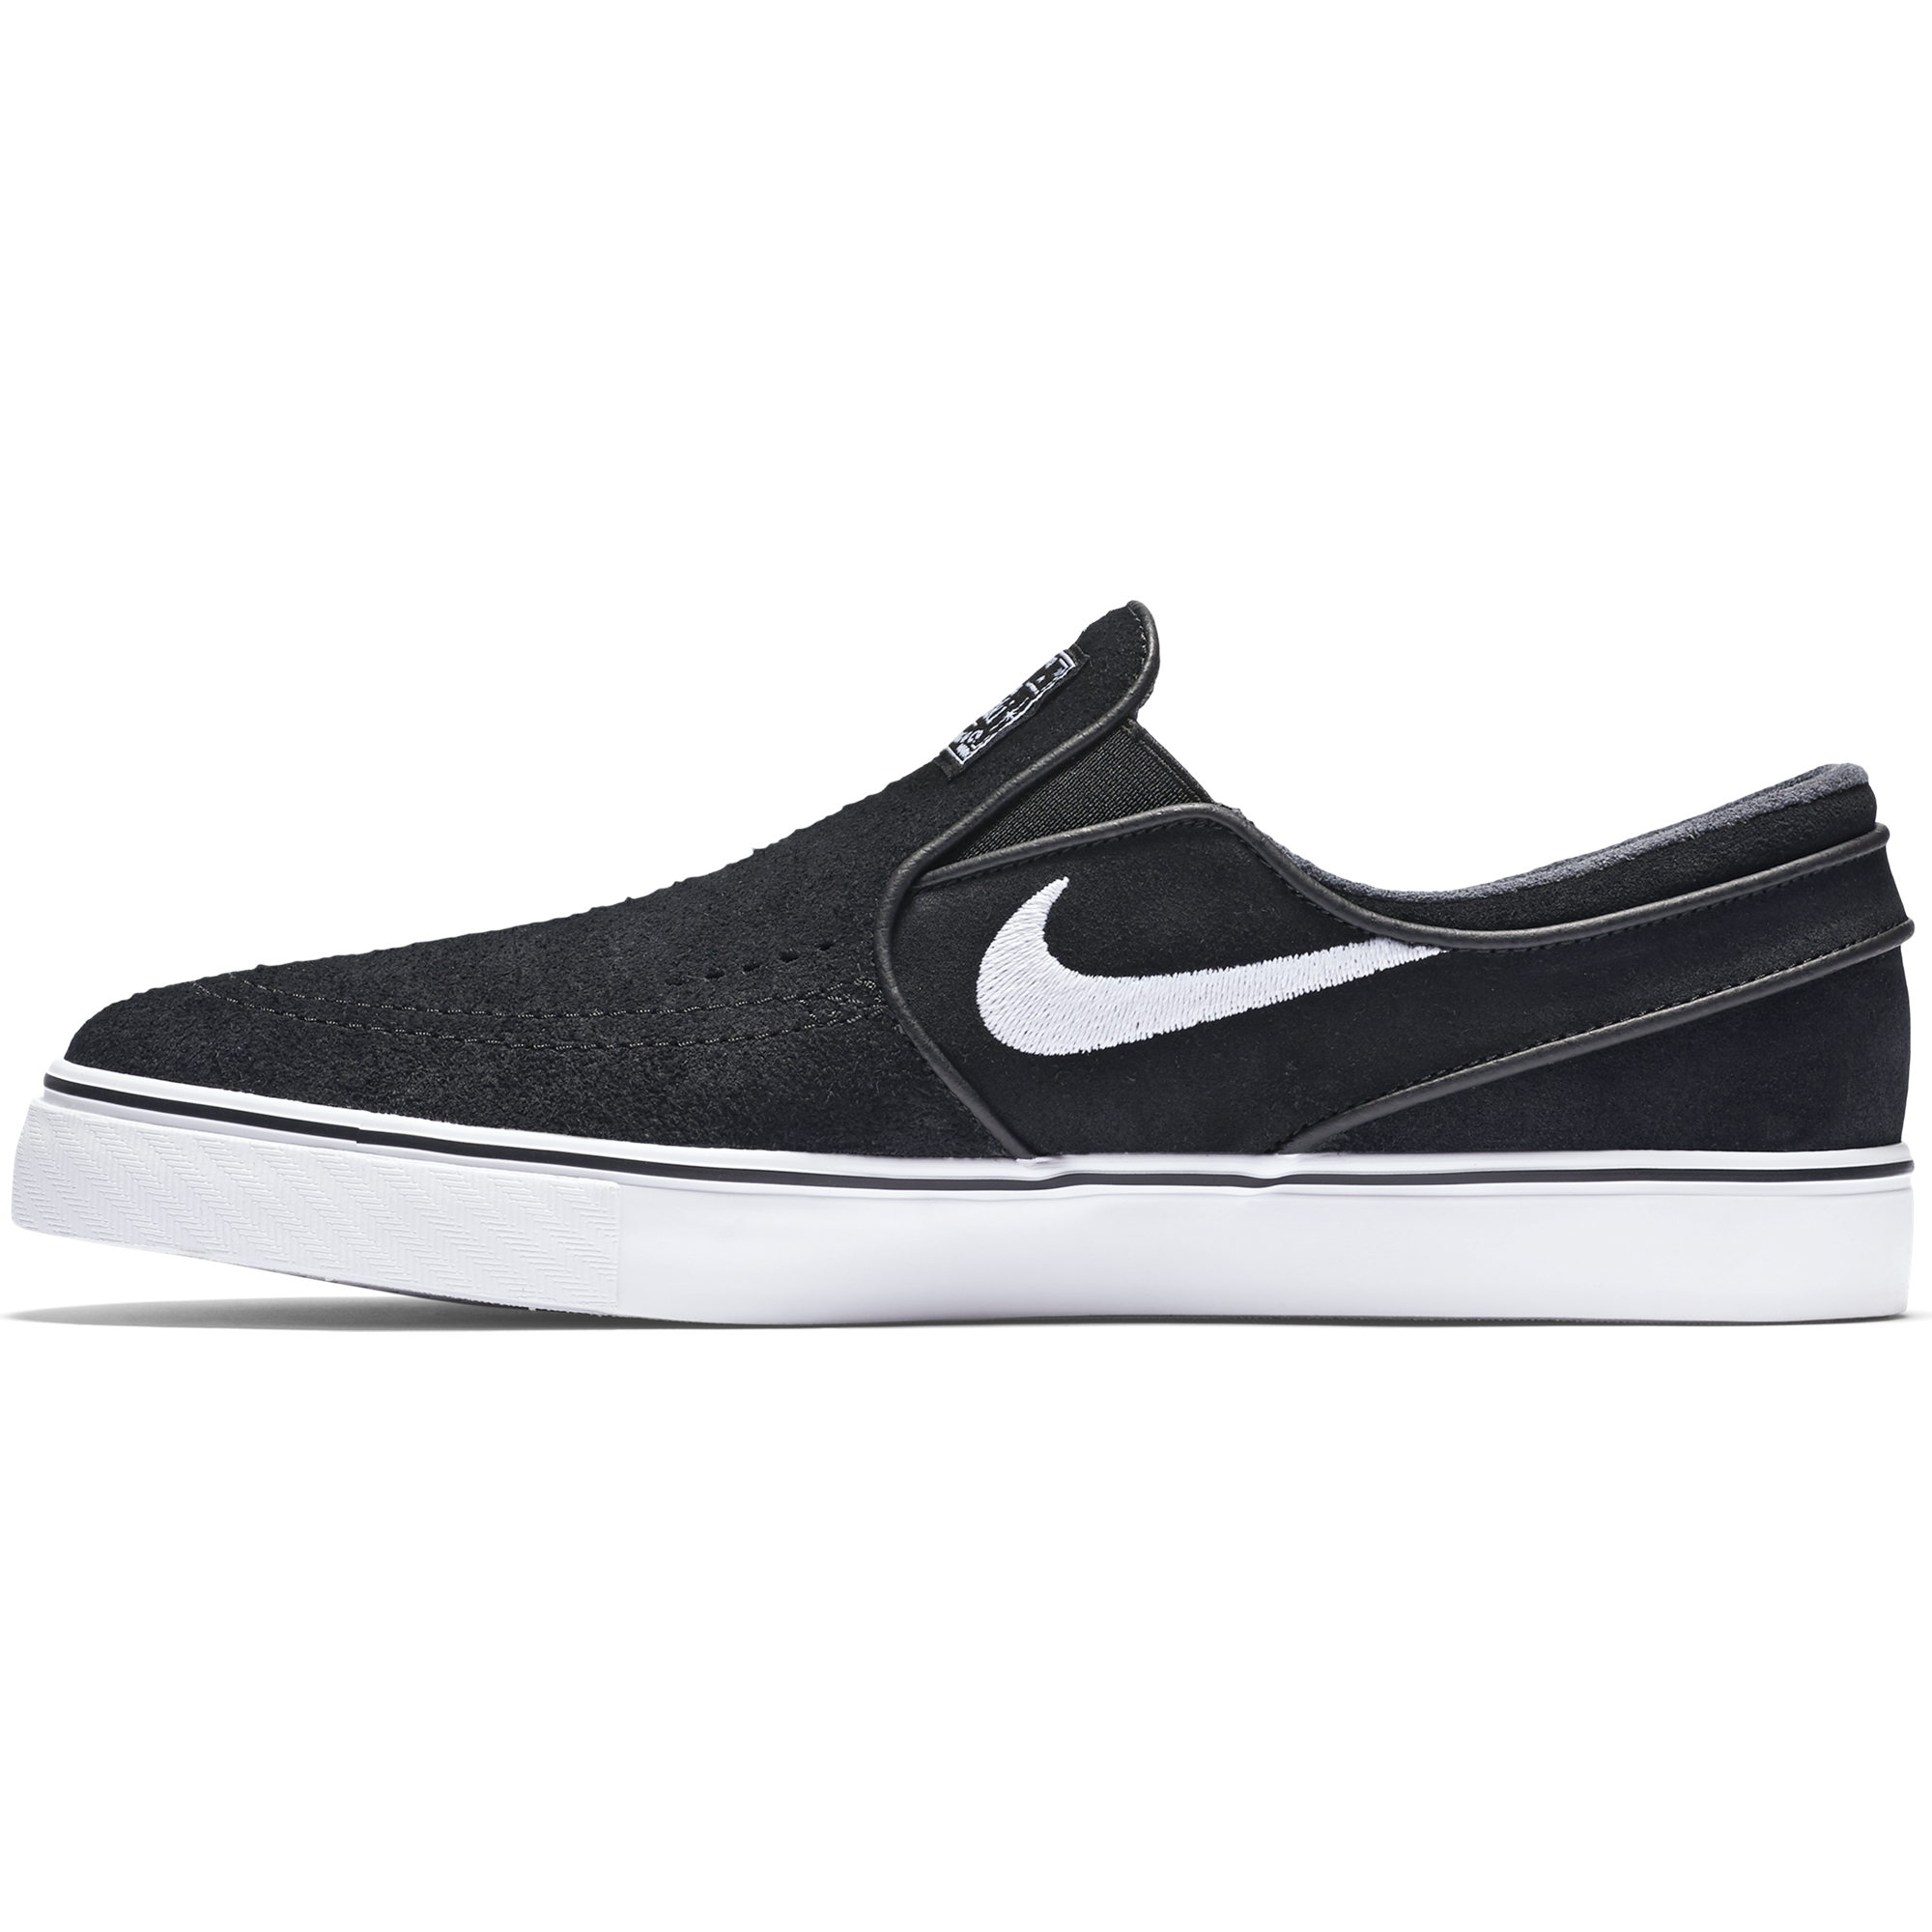 Nike SB Janoski Slip Black